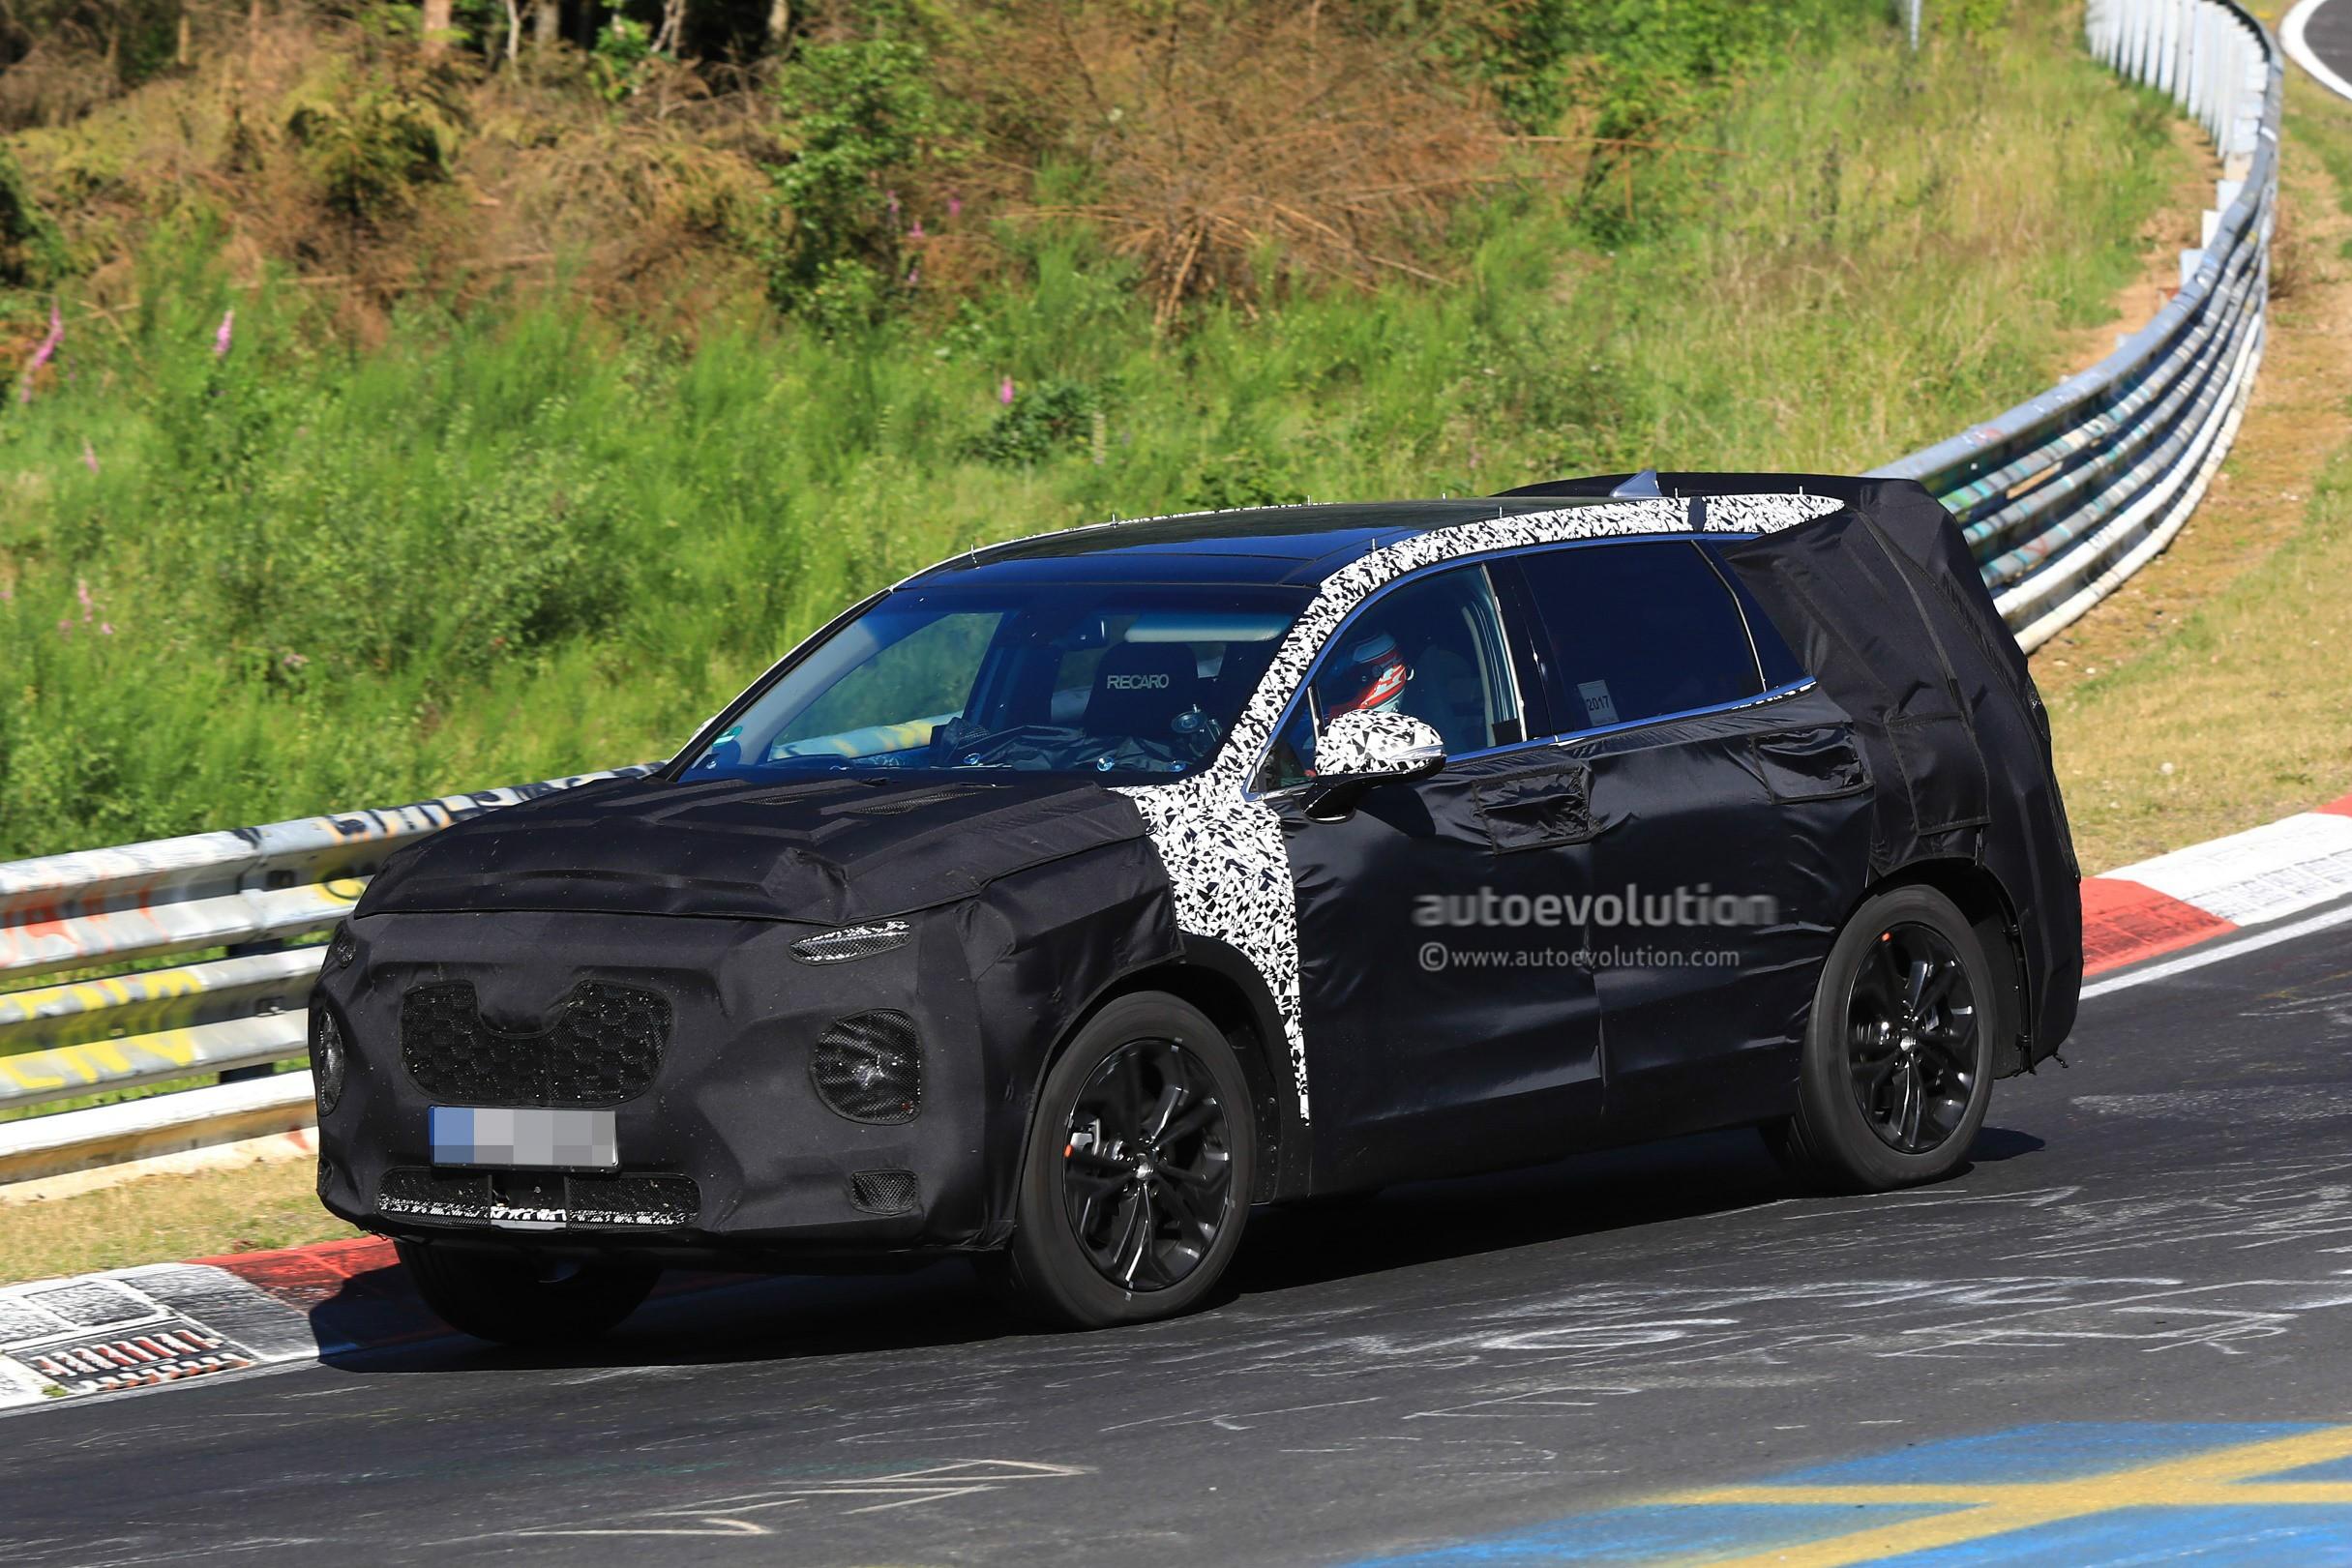 2019 Hyundai Santa Fe Masterfully Rendered By Brenthon ...